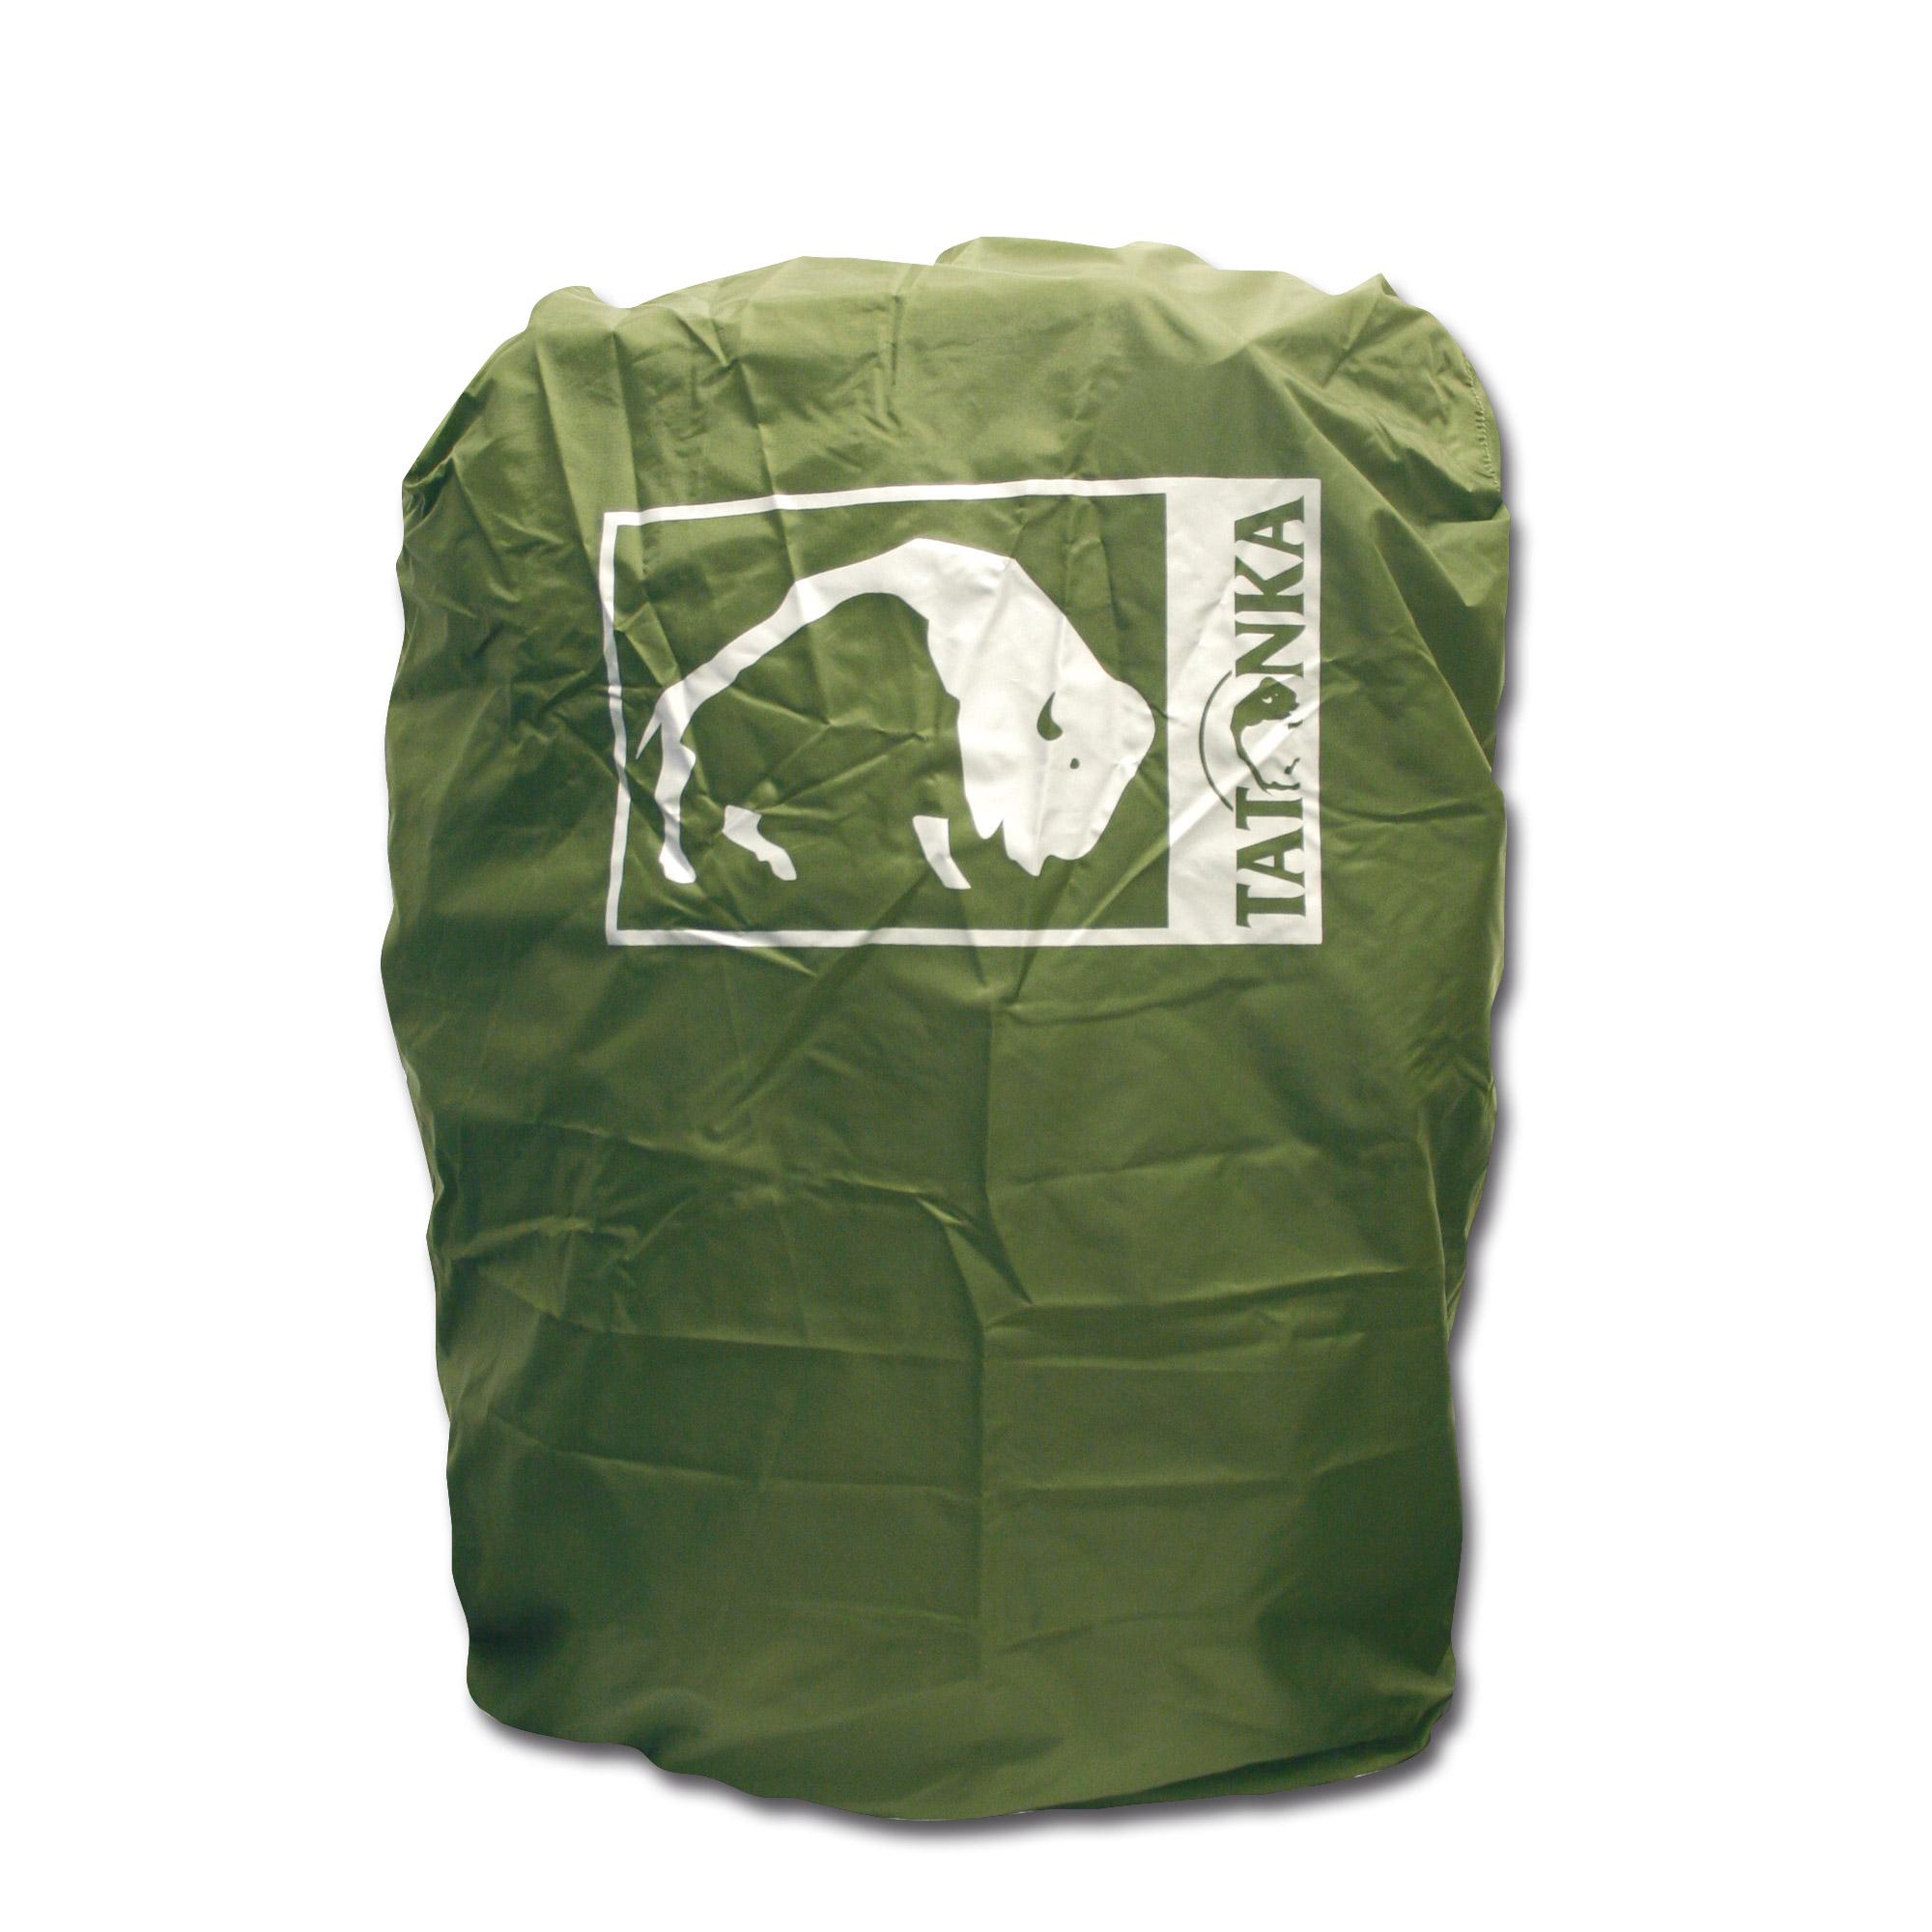 Rucksackhülle Tatonka grün Gr. XL